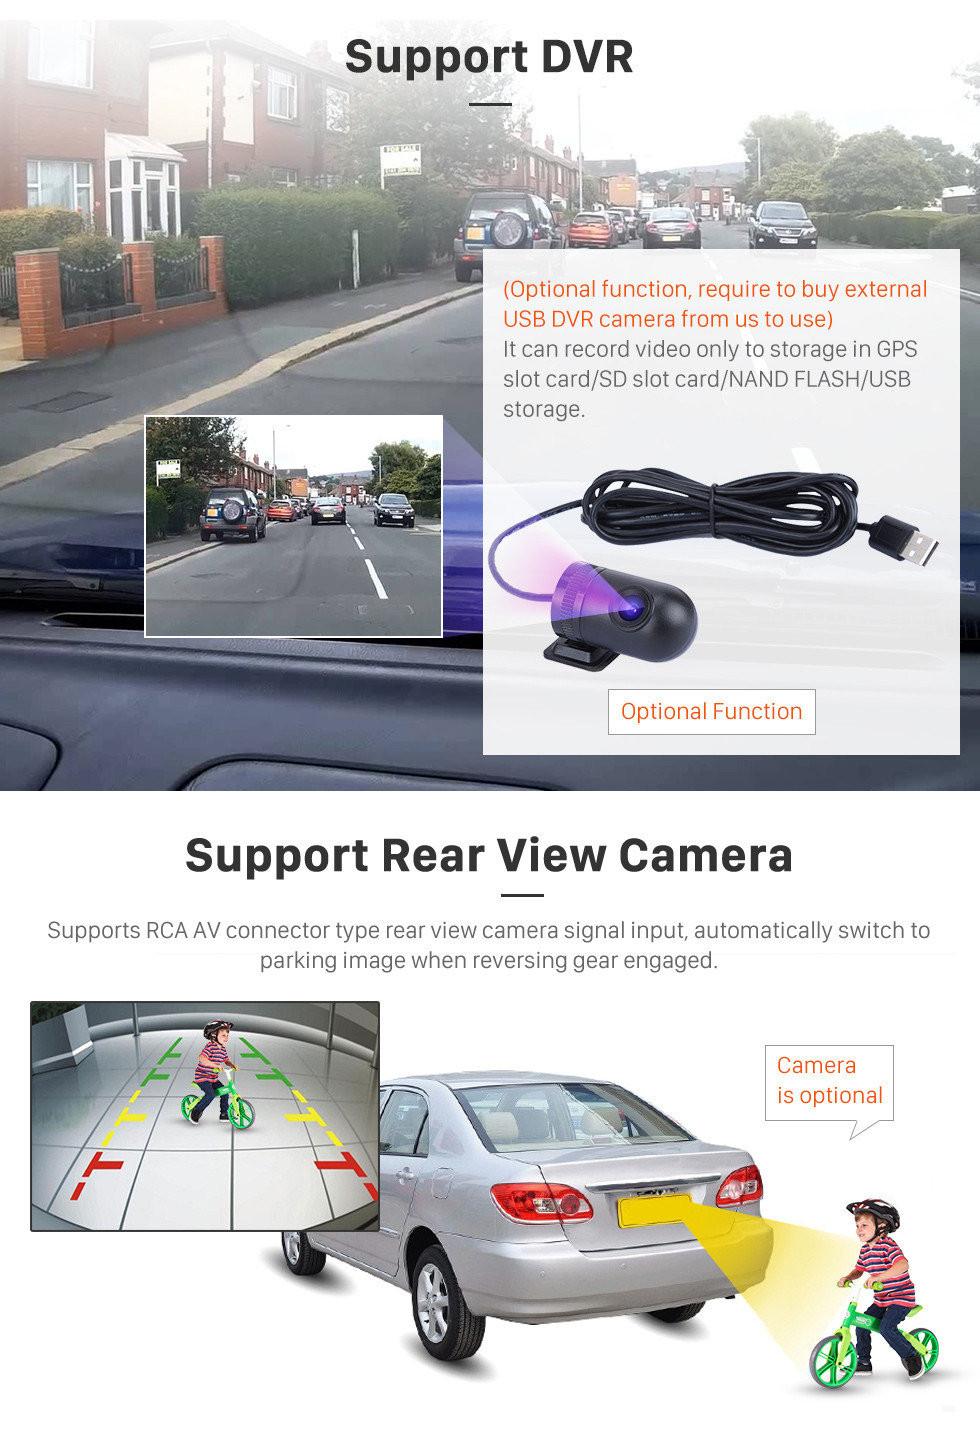 Seicane Android 10.0 10.1 inch 2012 Honda civic (LHD) Radio GPS Navigation Car stereo with Bluetooth Digital TV Mirror Link OBD2 DVR Backup Camera TPMS RDS Steering Wheel Control